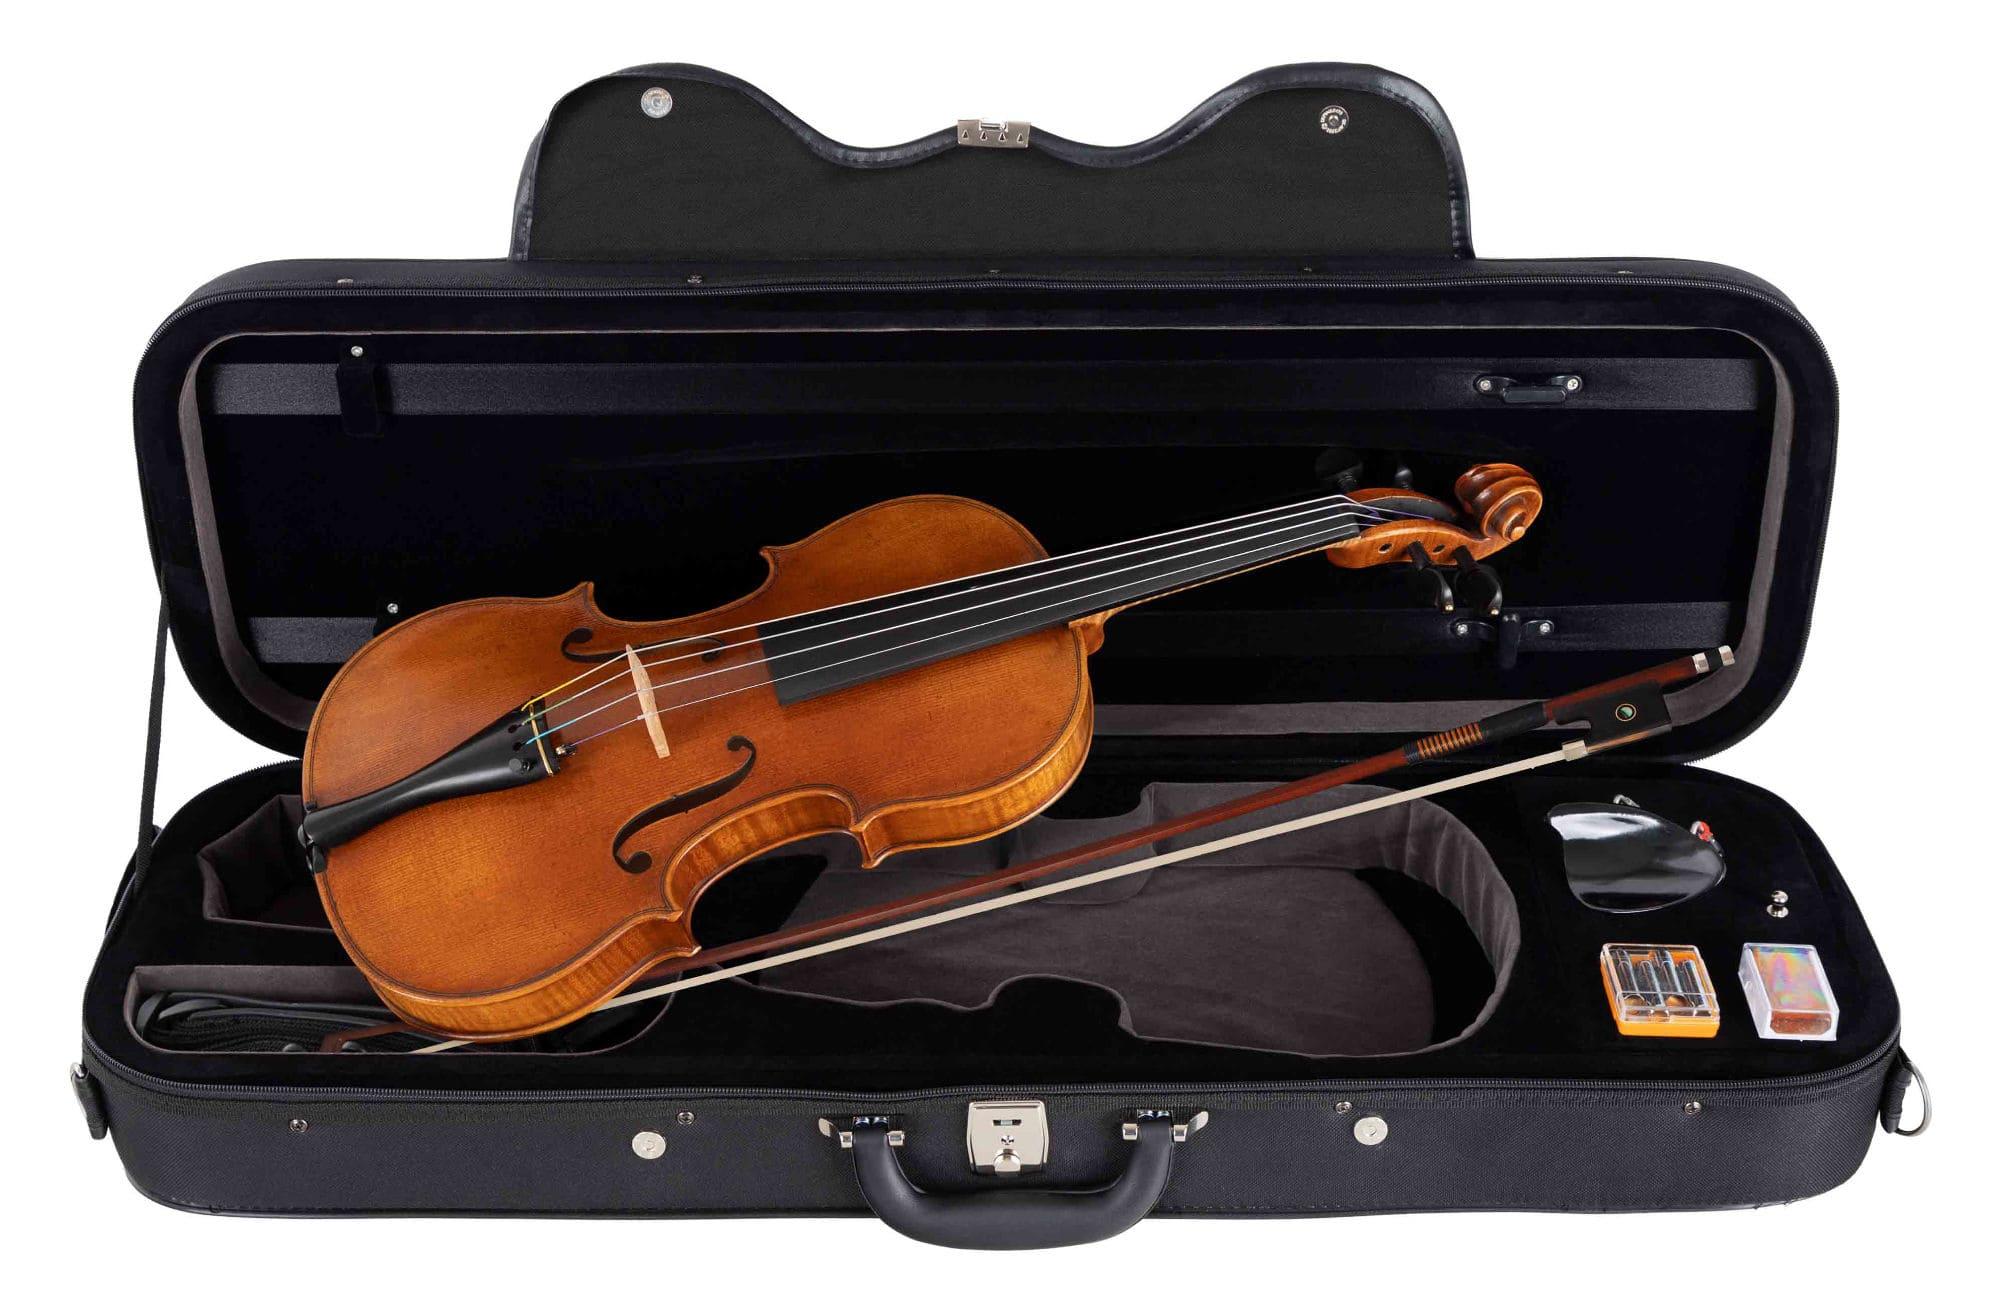 Violinen - Höfner H115 GG V Guarneri 4|4 Violinset - Onlineshop Musikhaus Kirstein